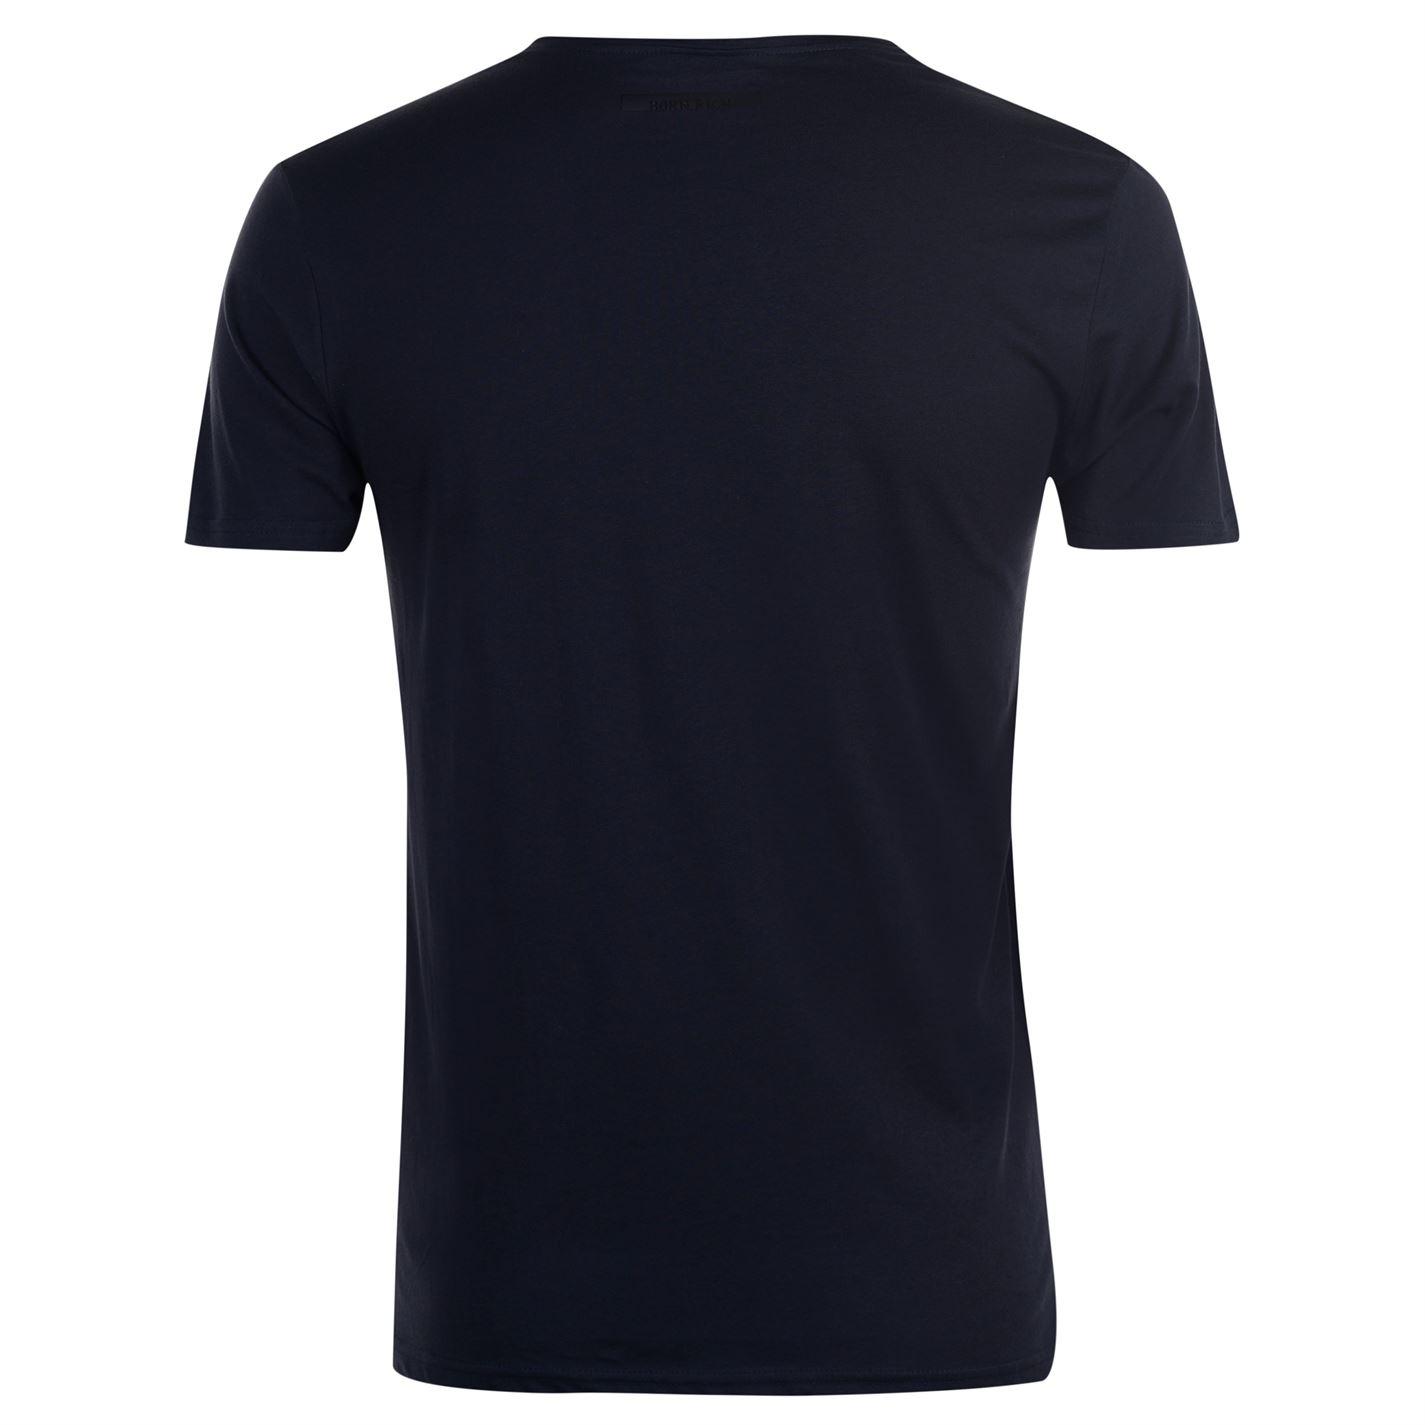 Born Rich Agate T Shirt Mens Gents V Neck Tee Top Short Sleeve